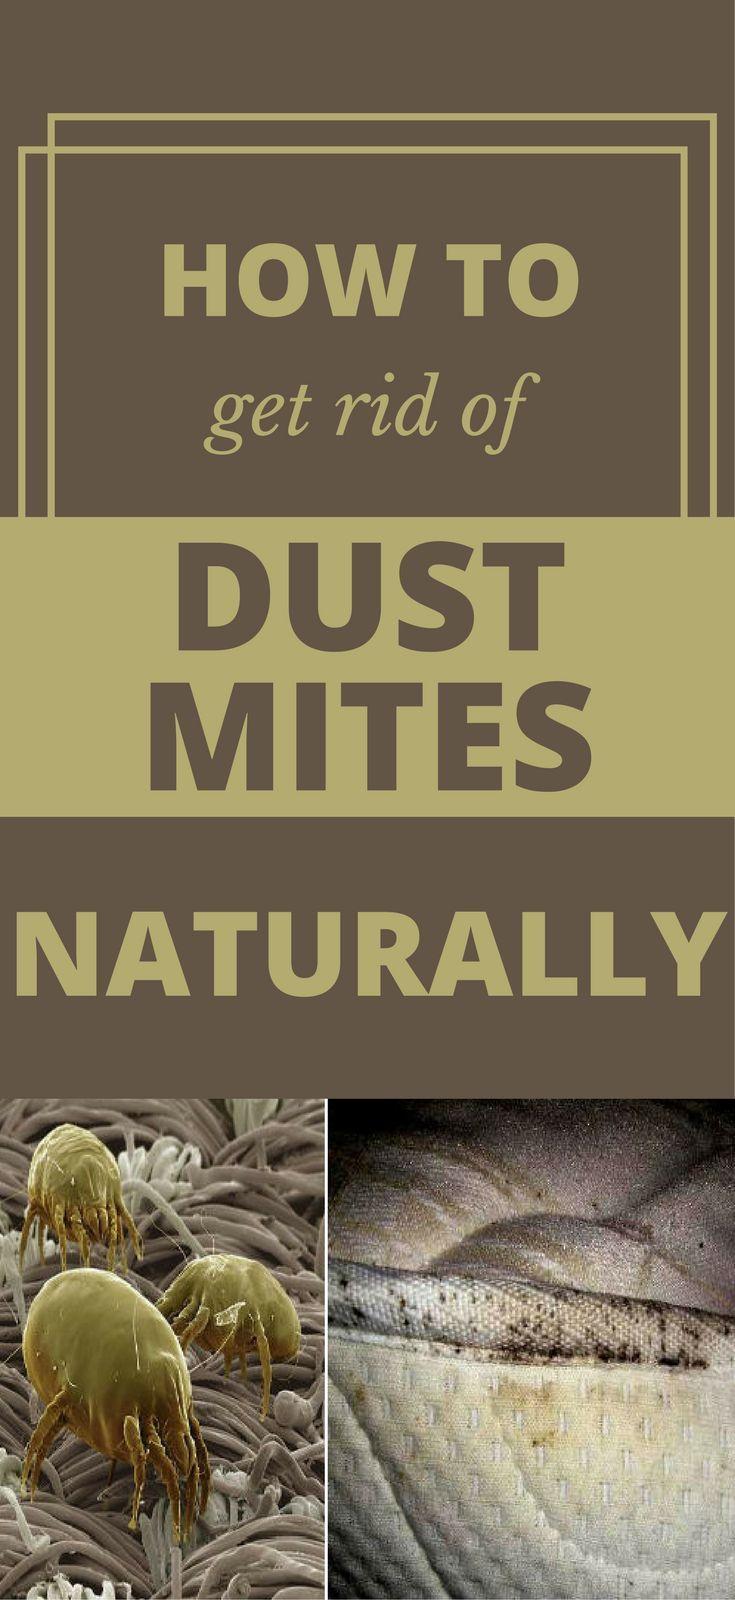 777 Best Dust Mite Images On Pinterest Dust Mites